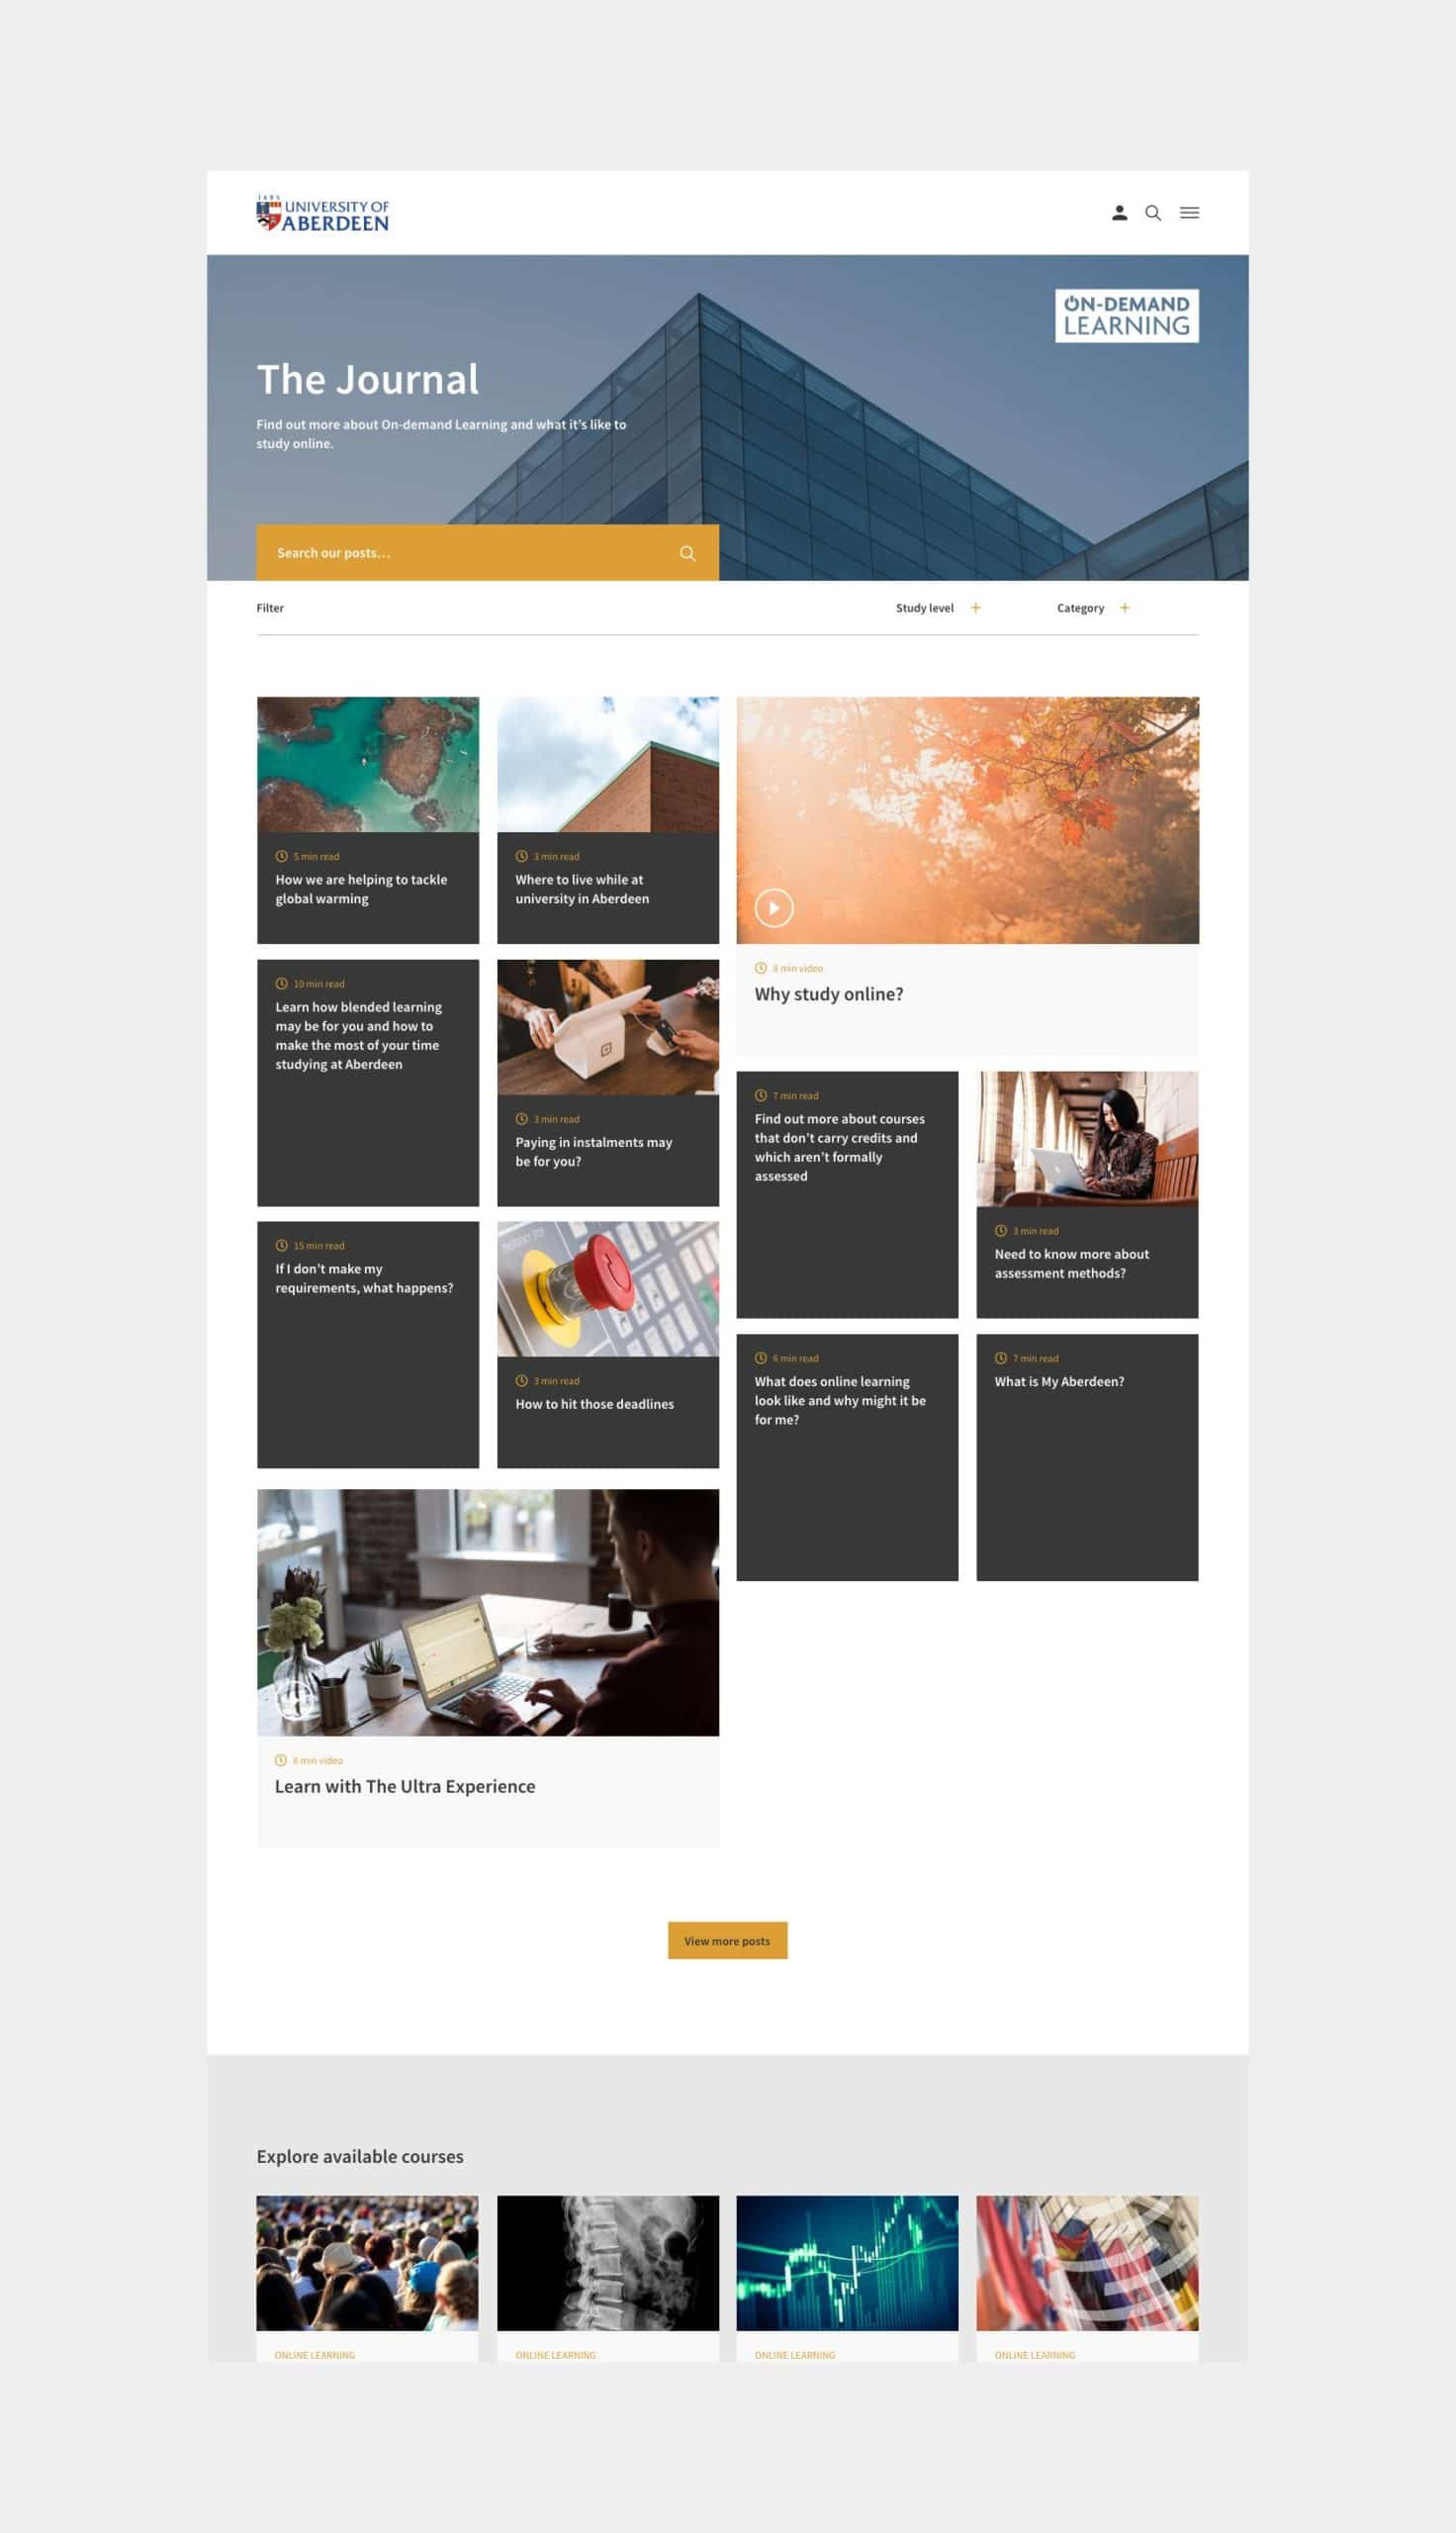 Website design for University of Aberdeen